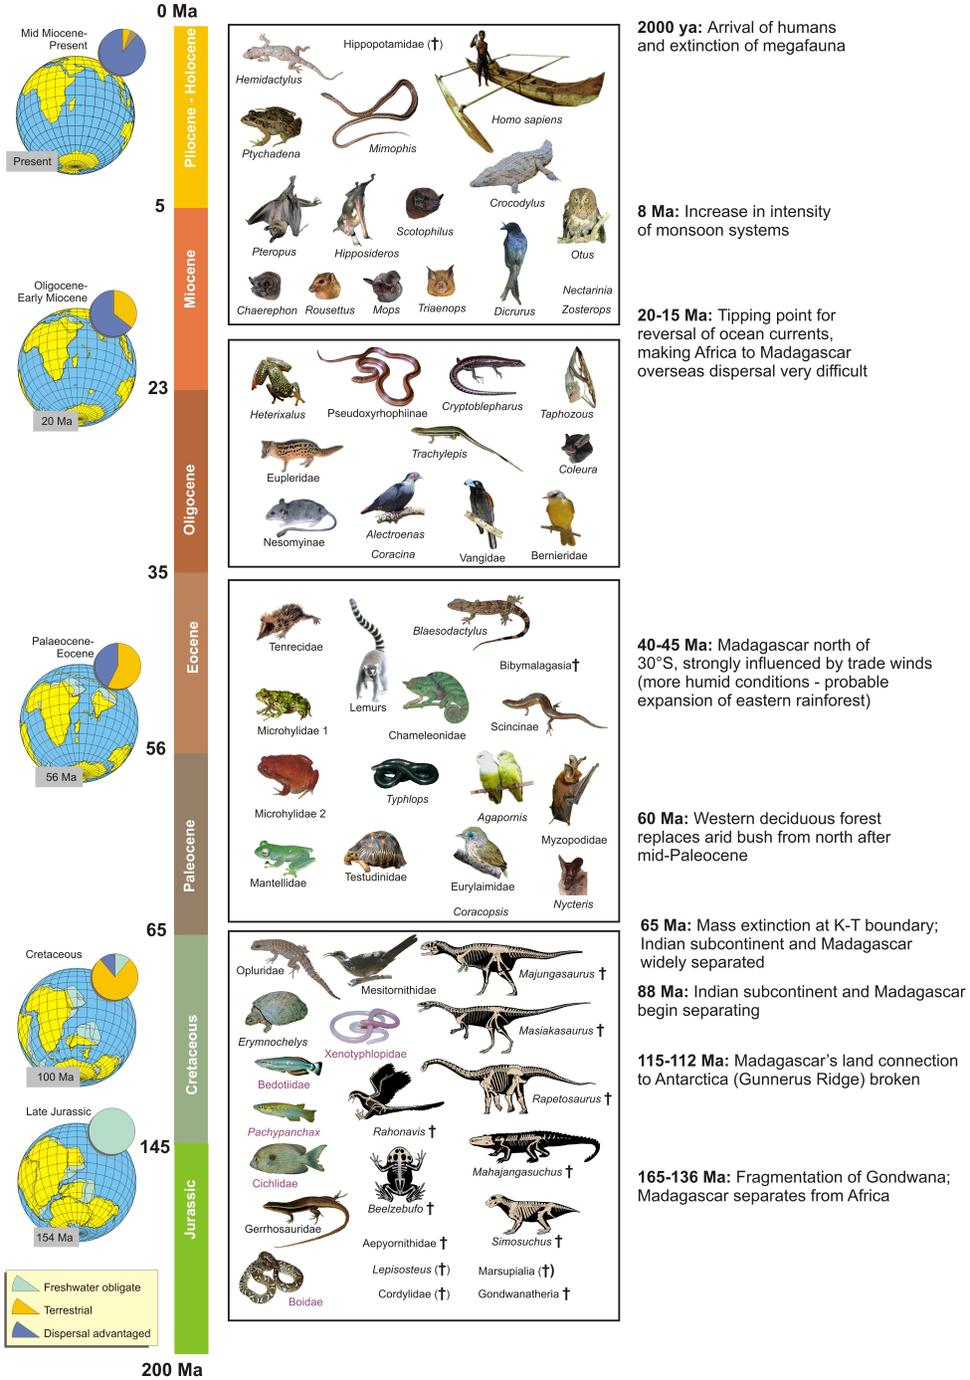 Biogeographic timetable of Madagascar - journal.pone.0062086.g003